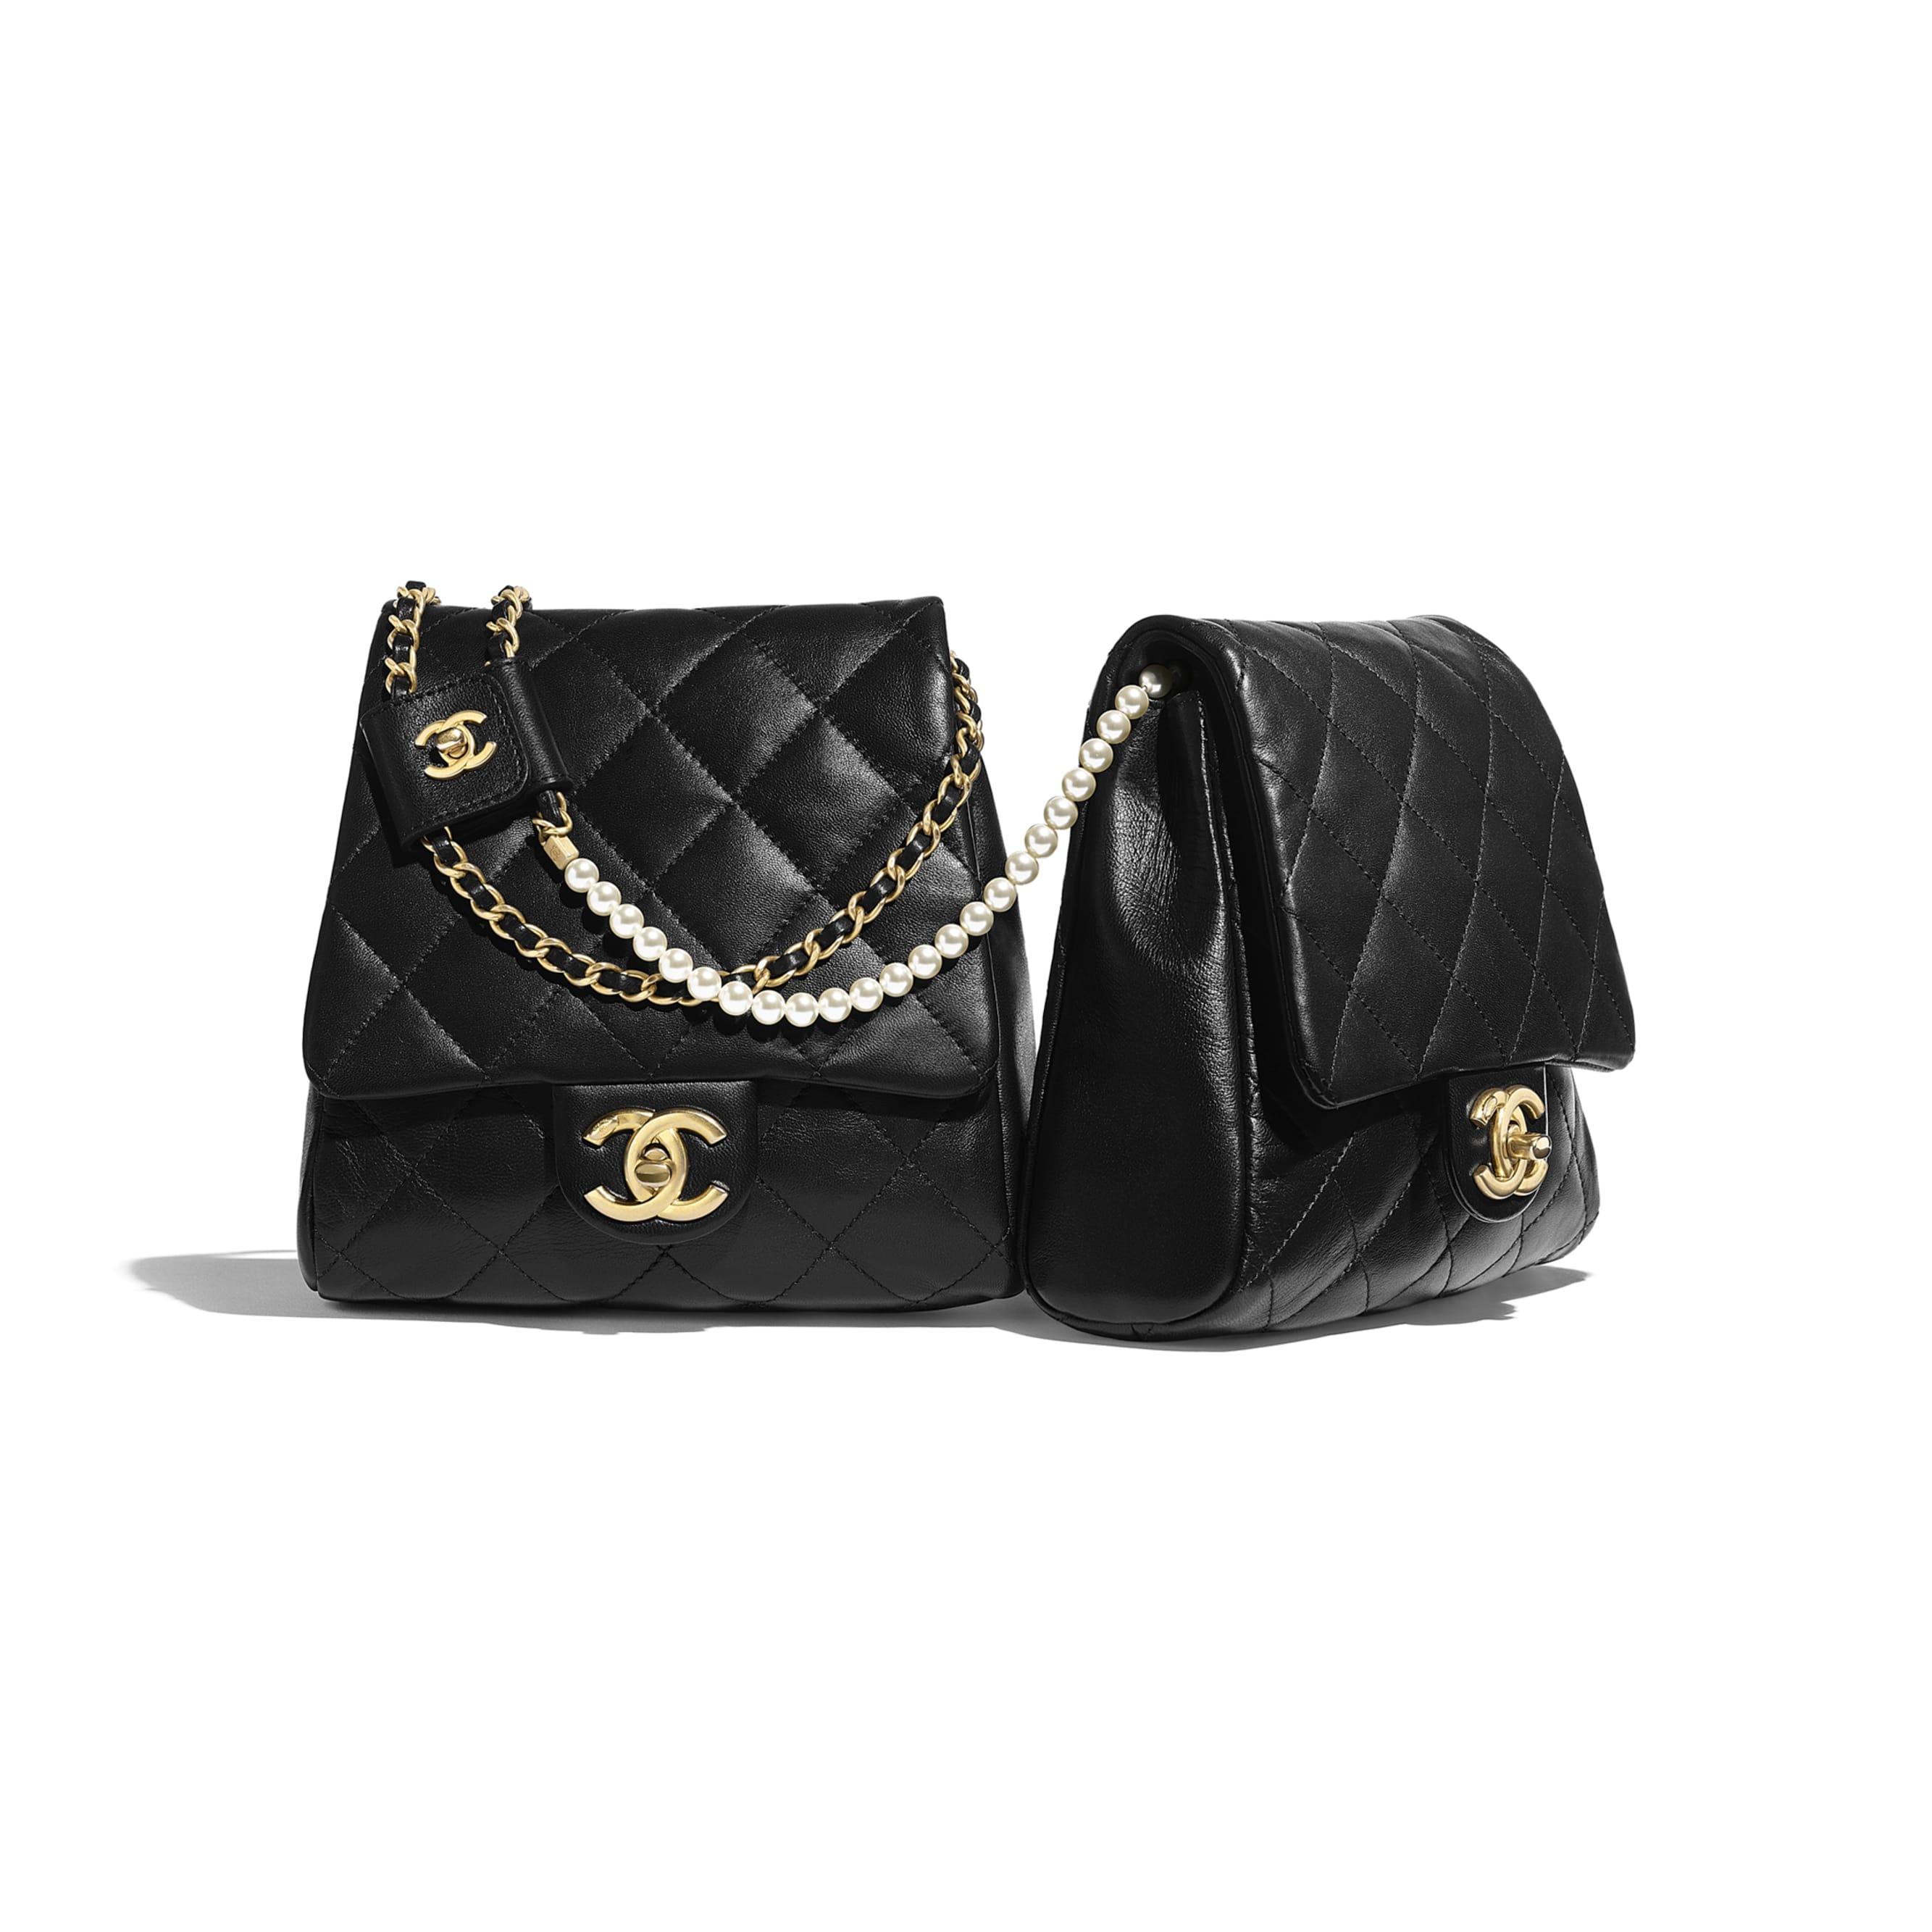 Side-Packs - Black - Lambskin, Imitation Pearls & Gold-Tone Metal - Default view - see standard sized version